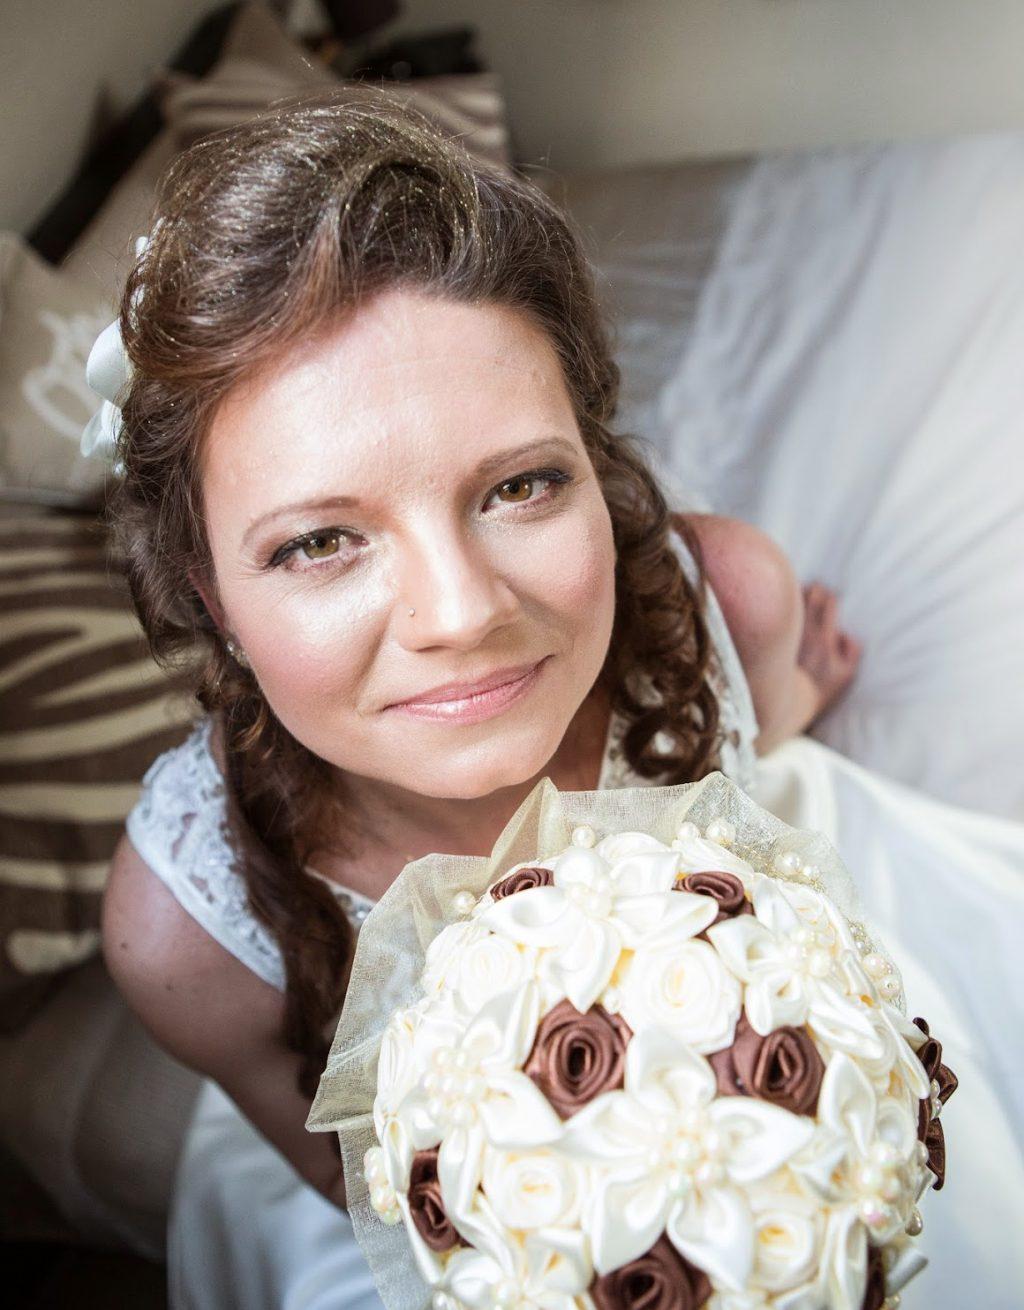 img src=wedding photography bristol.jpg alt=wedding couple (28)